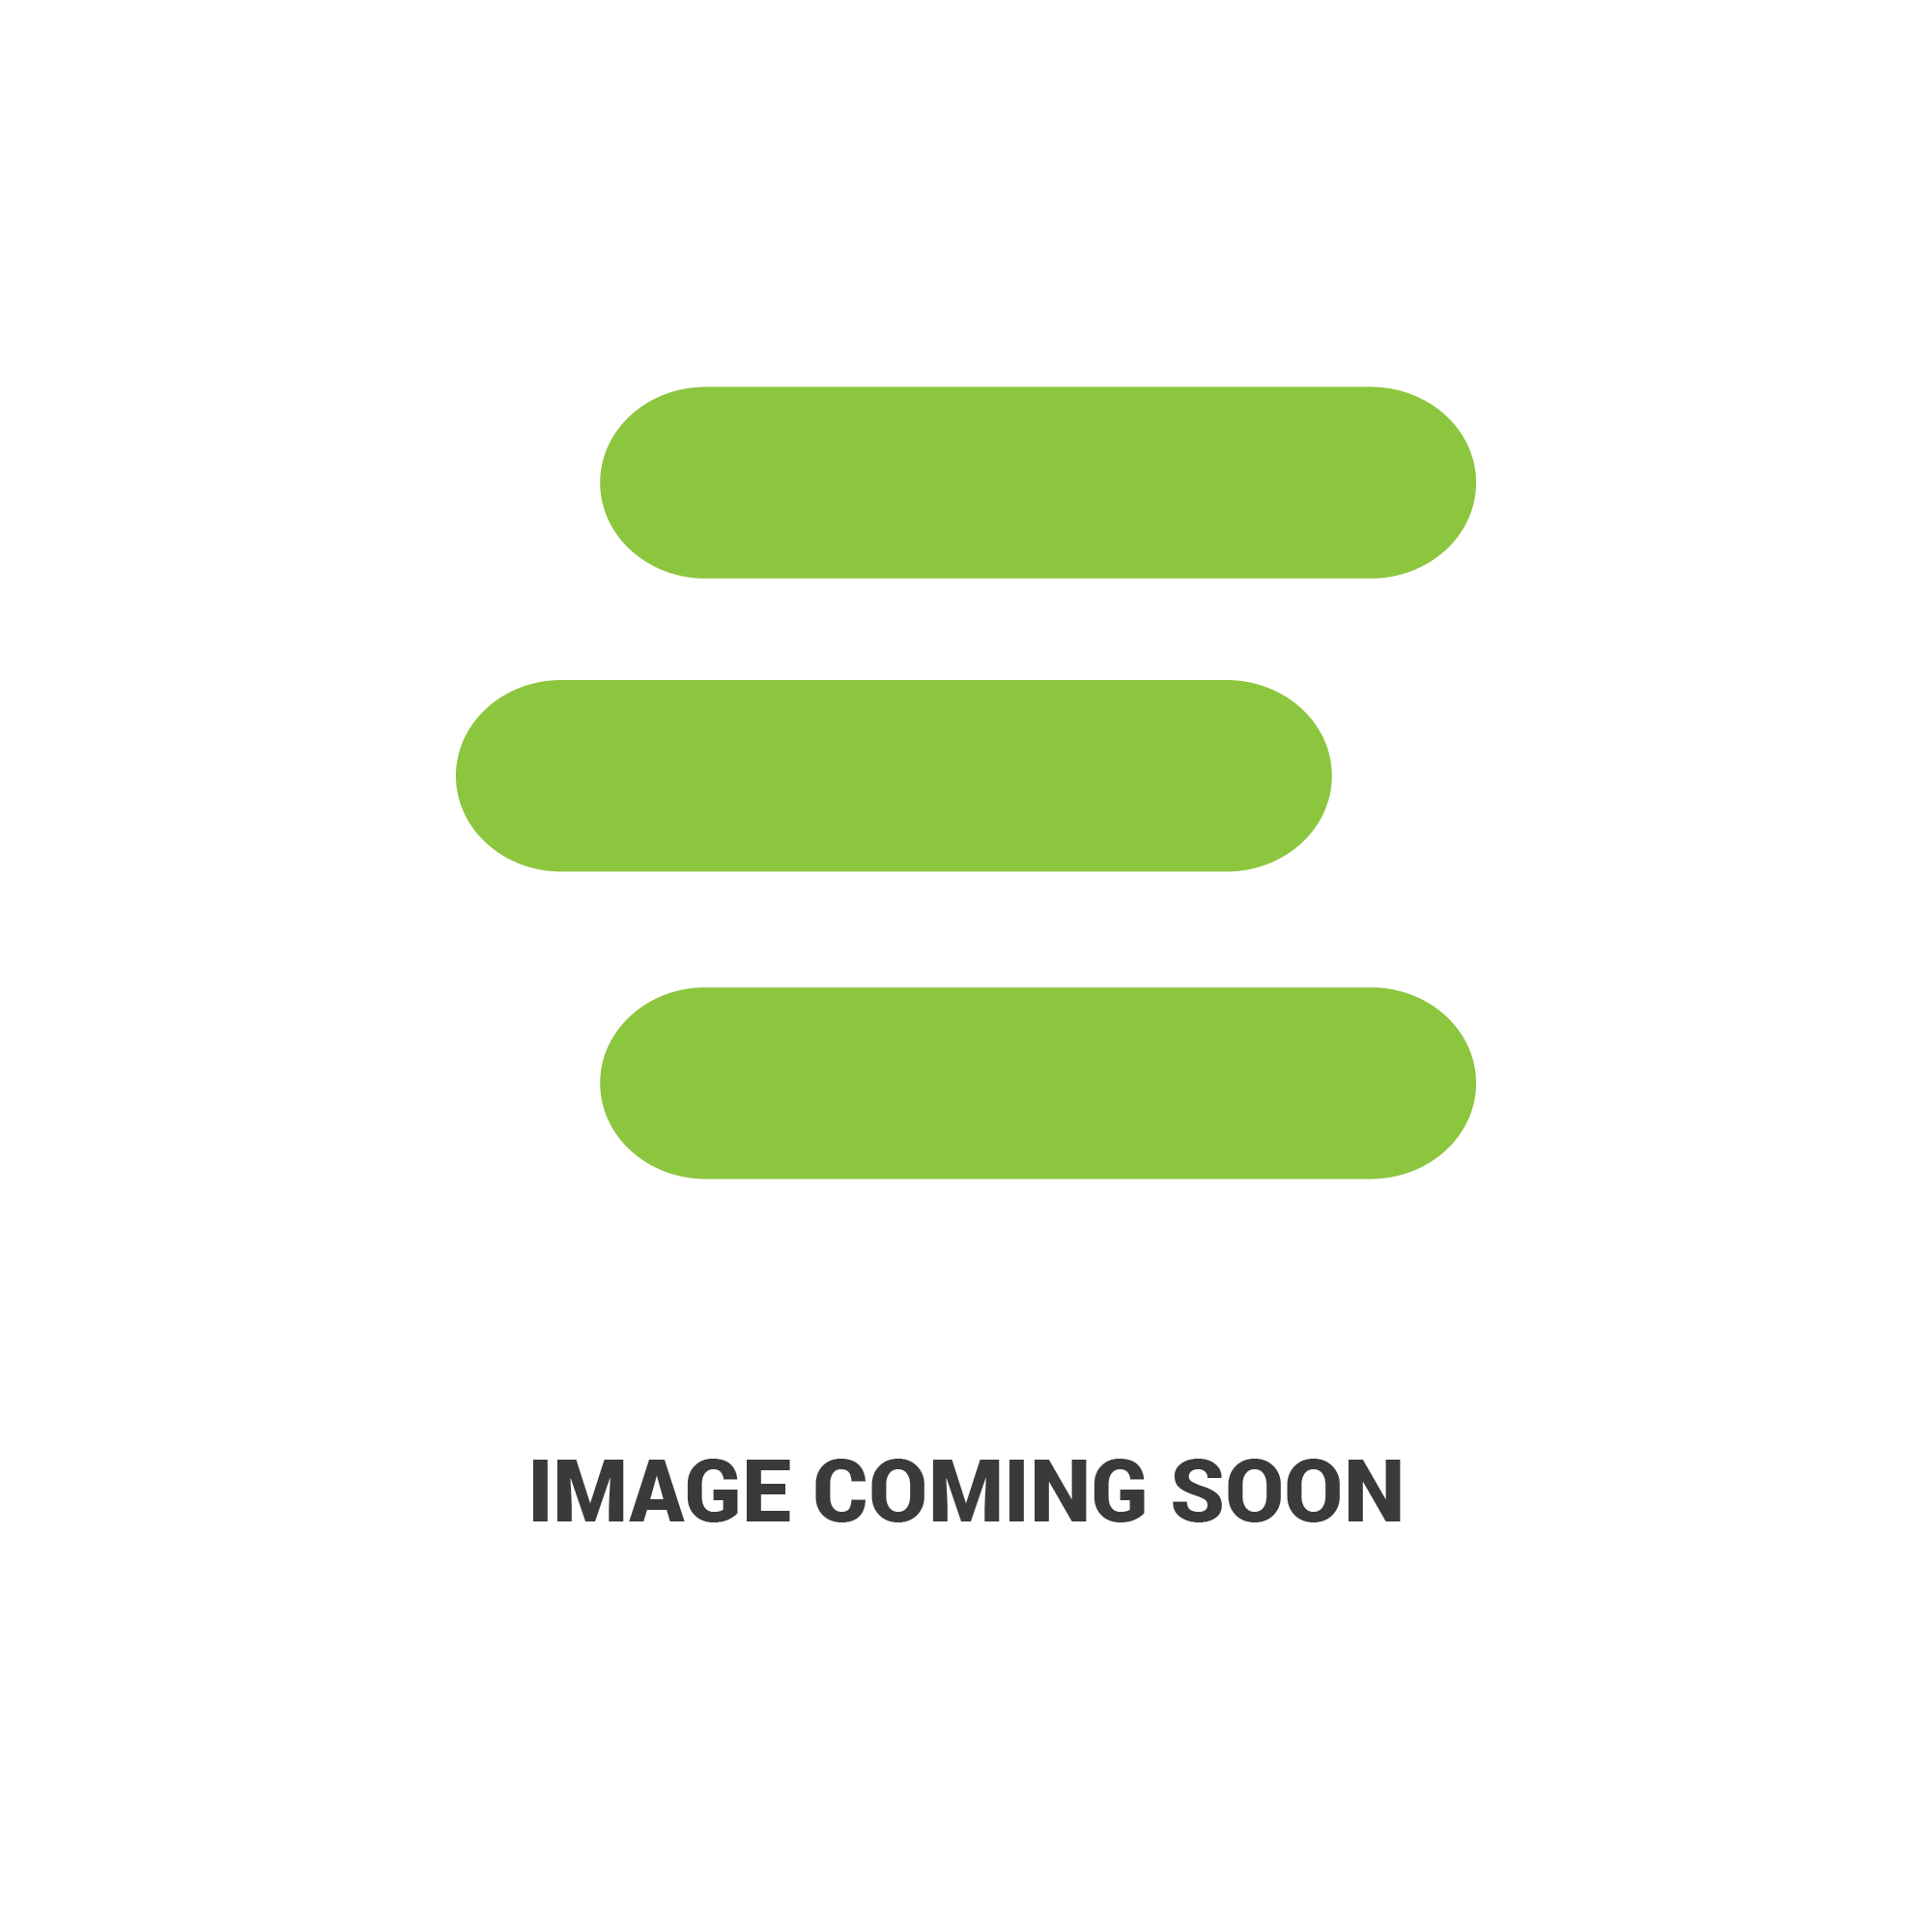 E-6685105edit 1.jpg